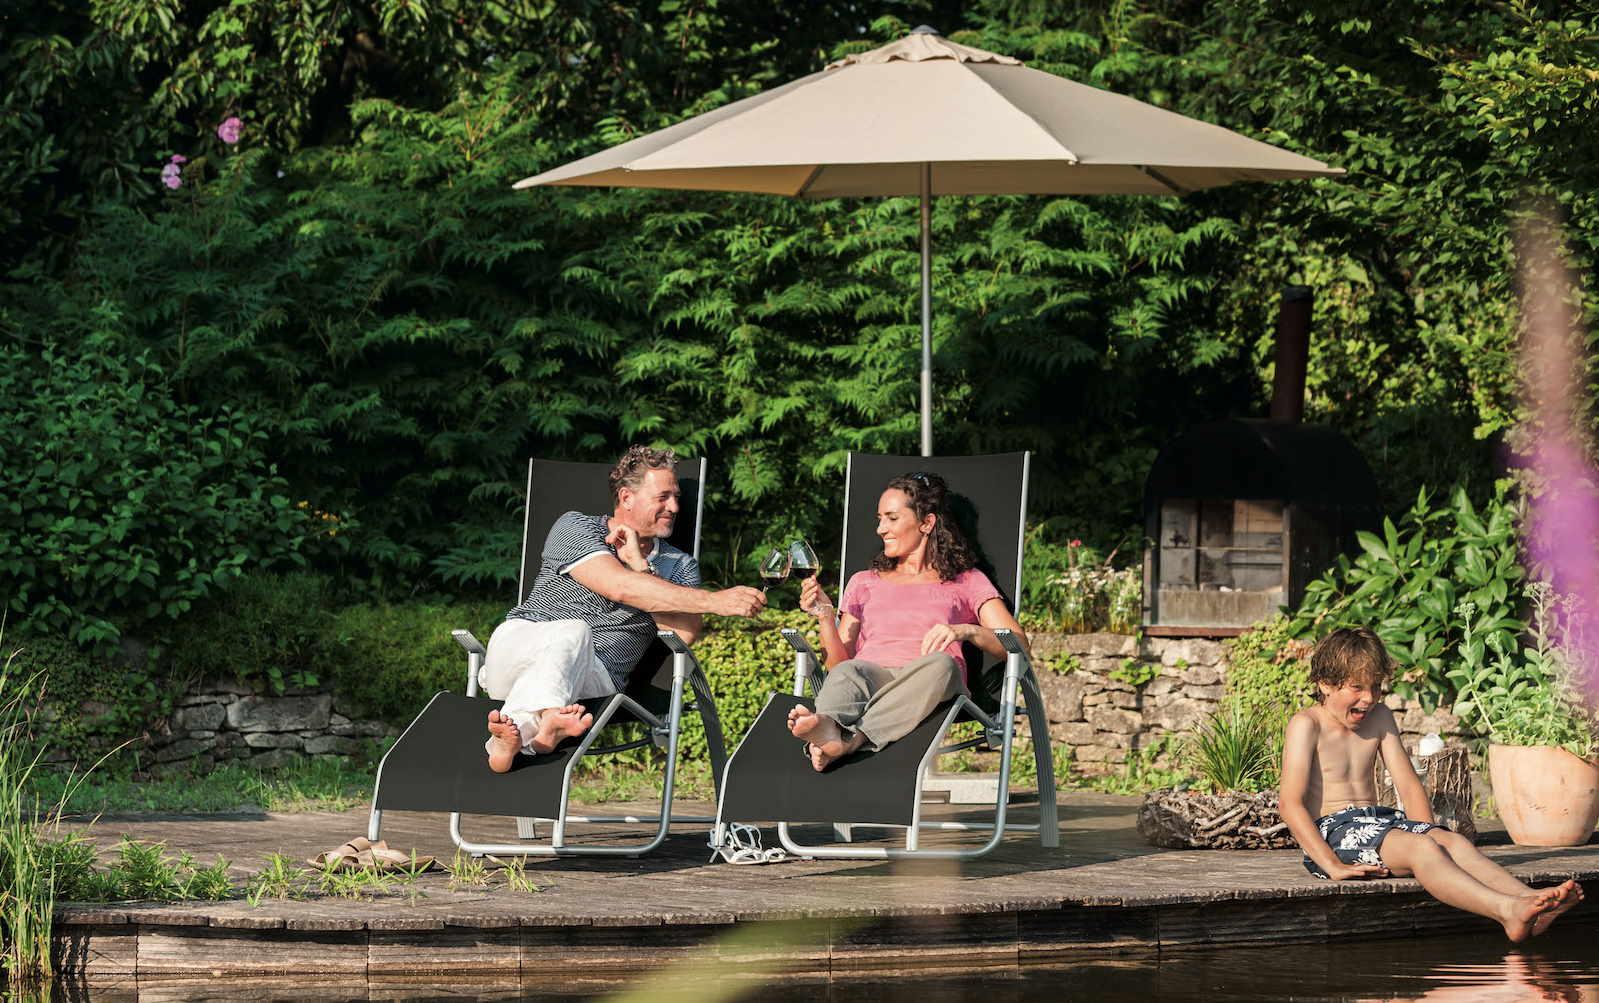 KETTLER Sonnenschirme bei Gartenmoebel-NRW